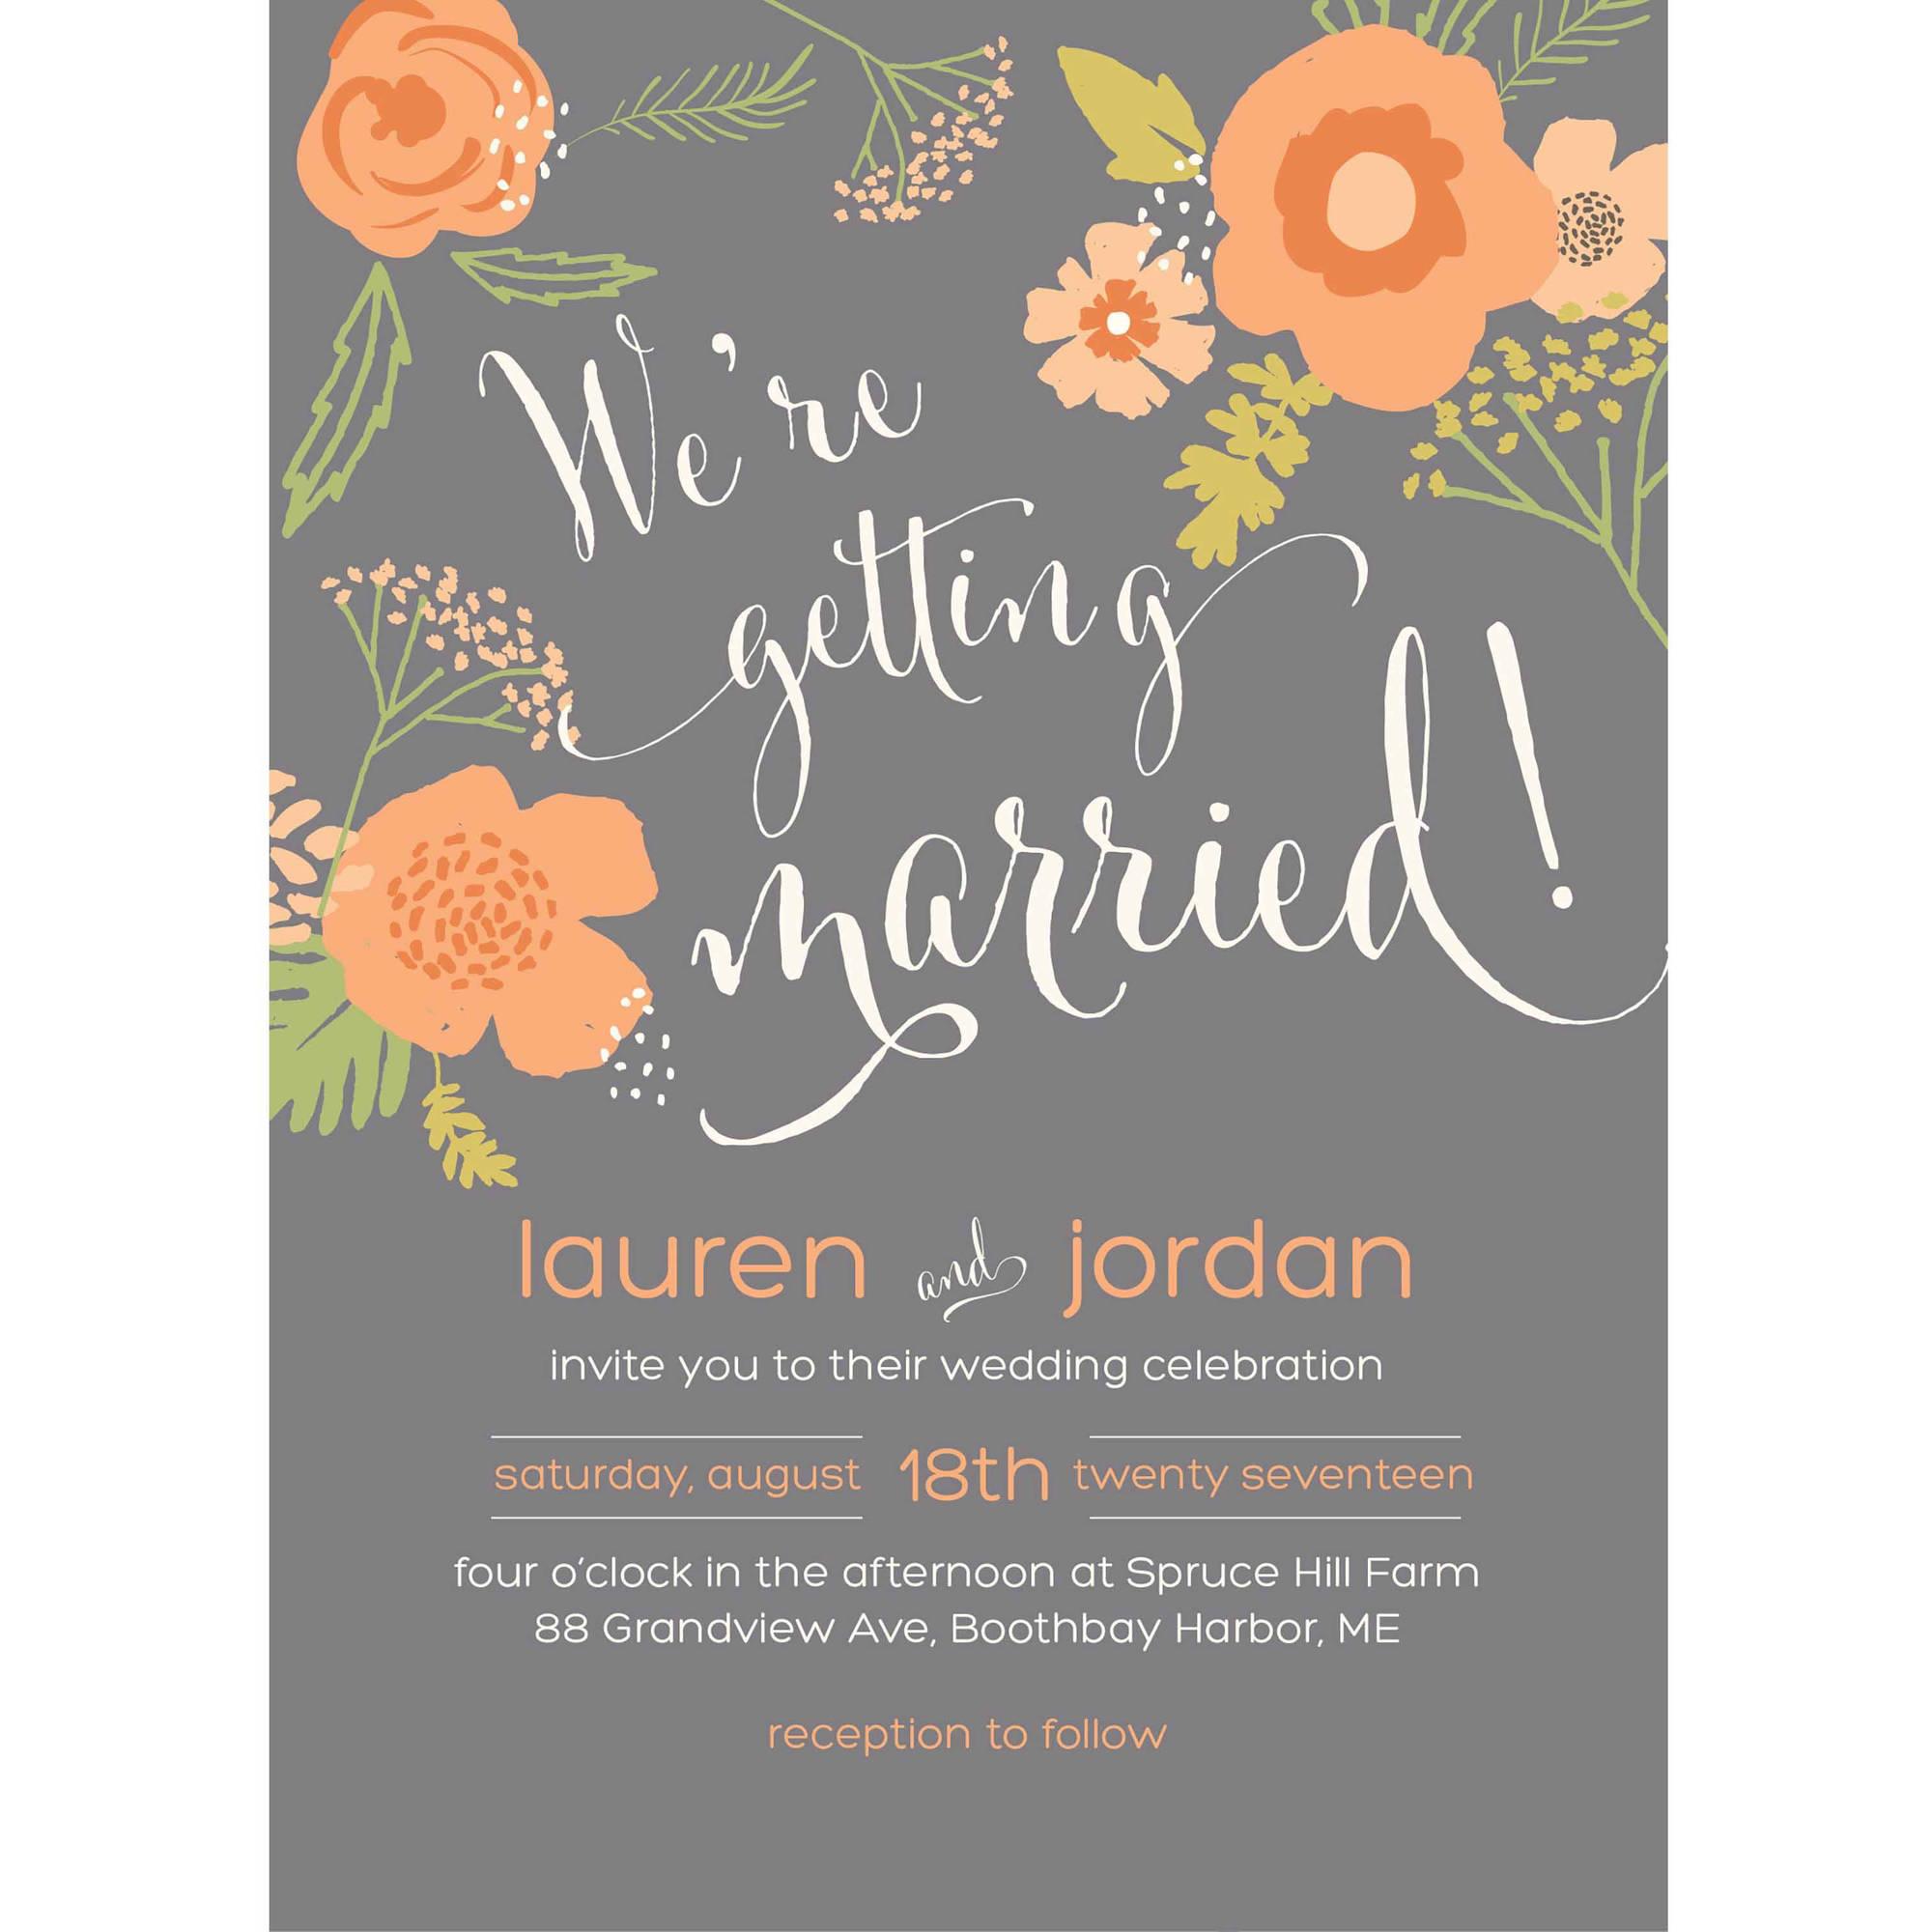 Getting Married Standard Wedding Invitation